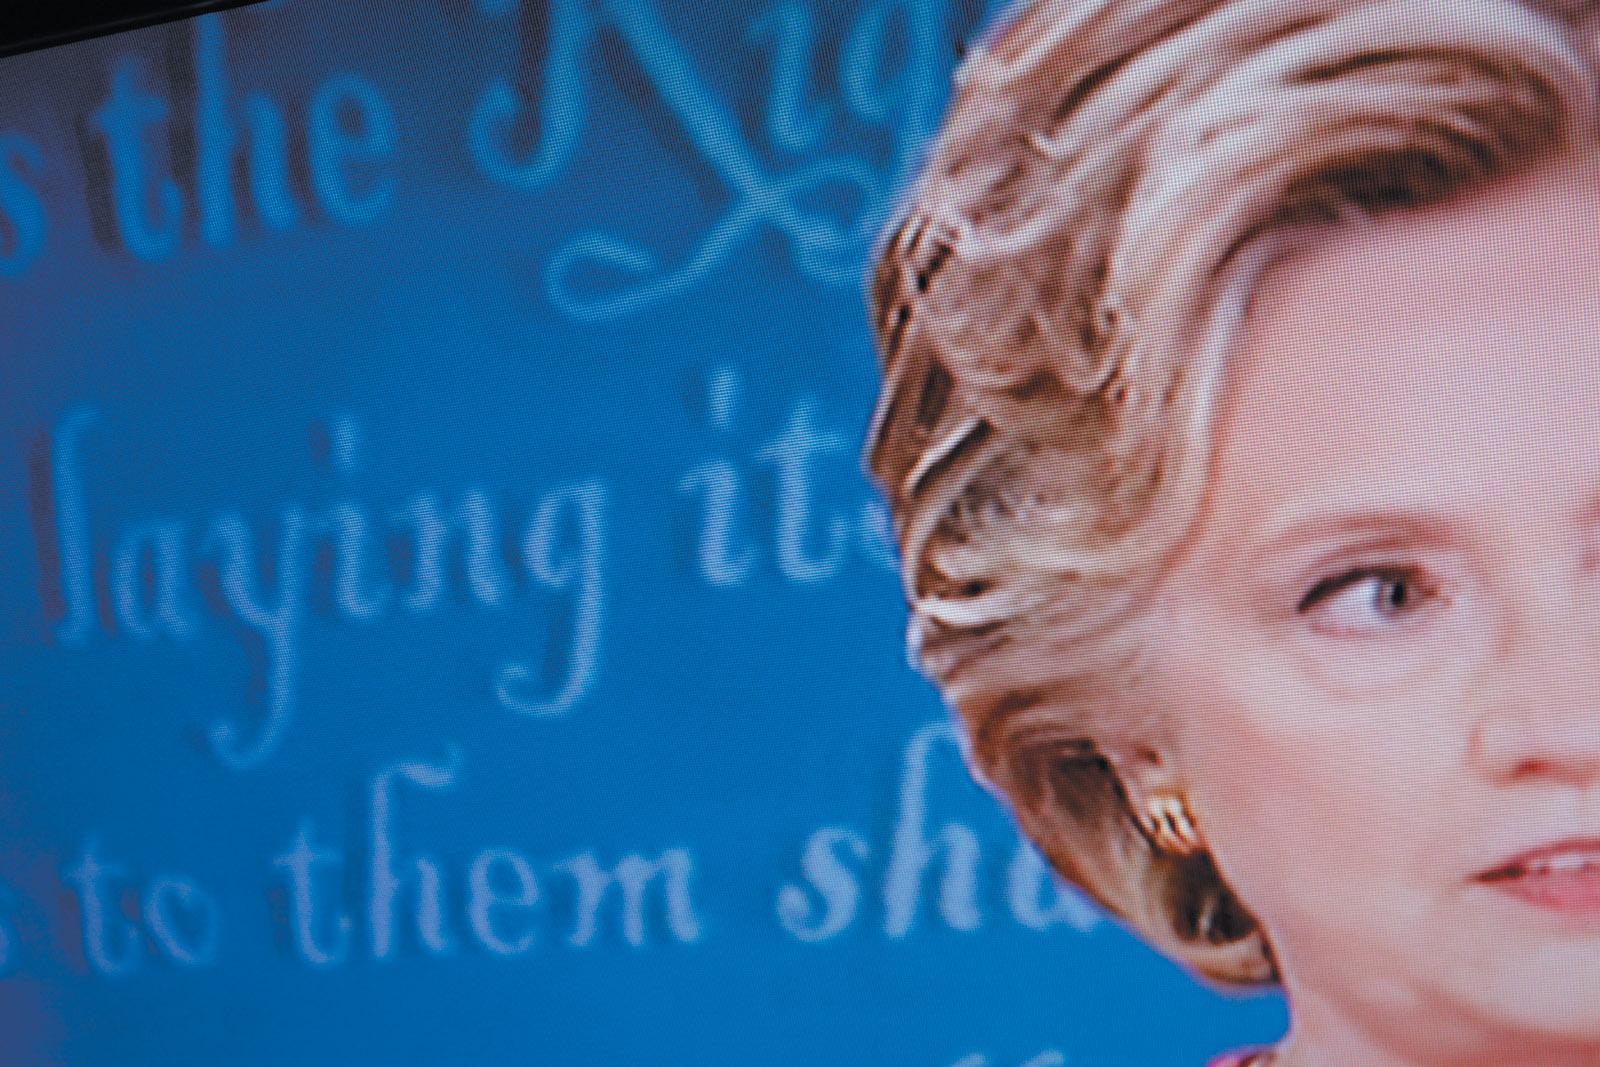 Hillary Clinton at the first presidential debate, Hofstra University, Hempstead, New York, September 26, 2016